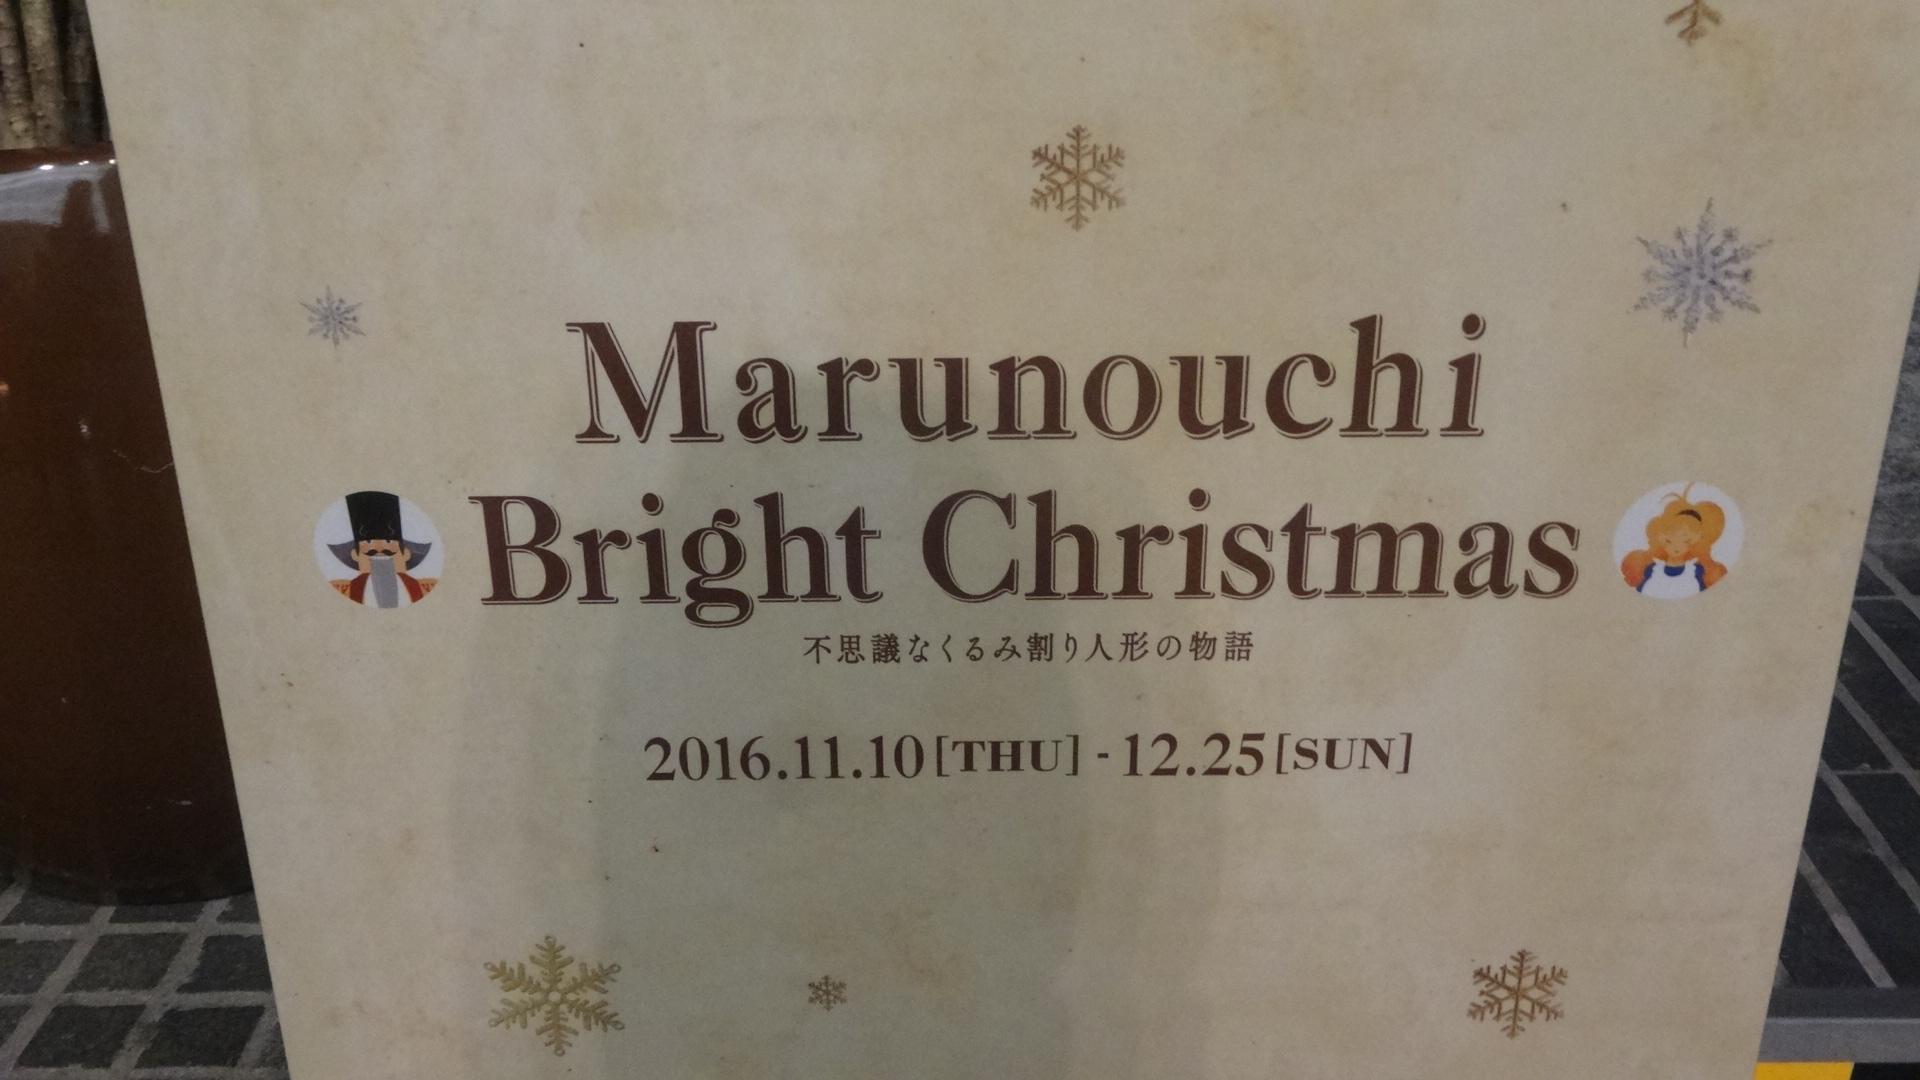 Marunouchi Bright Christmas 不思議なくるみ割り人形の物語の看板